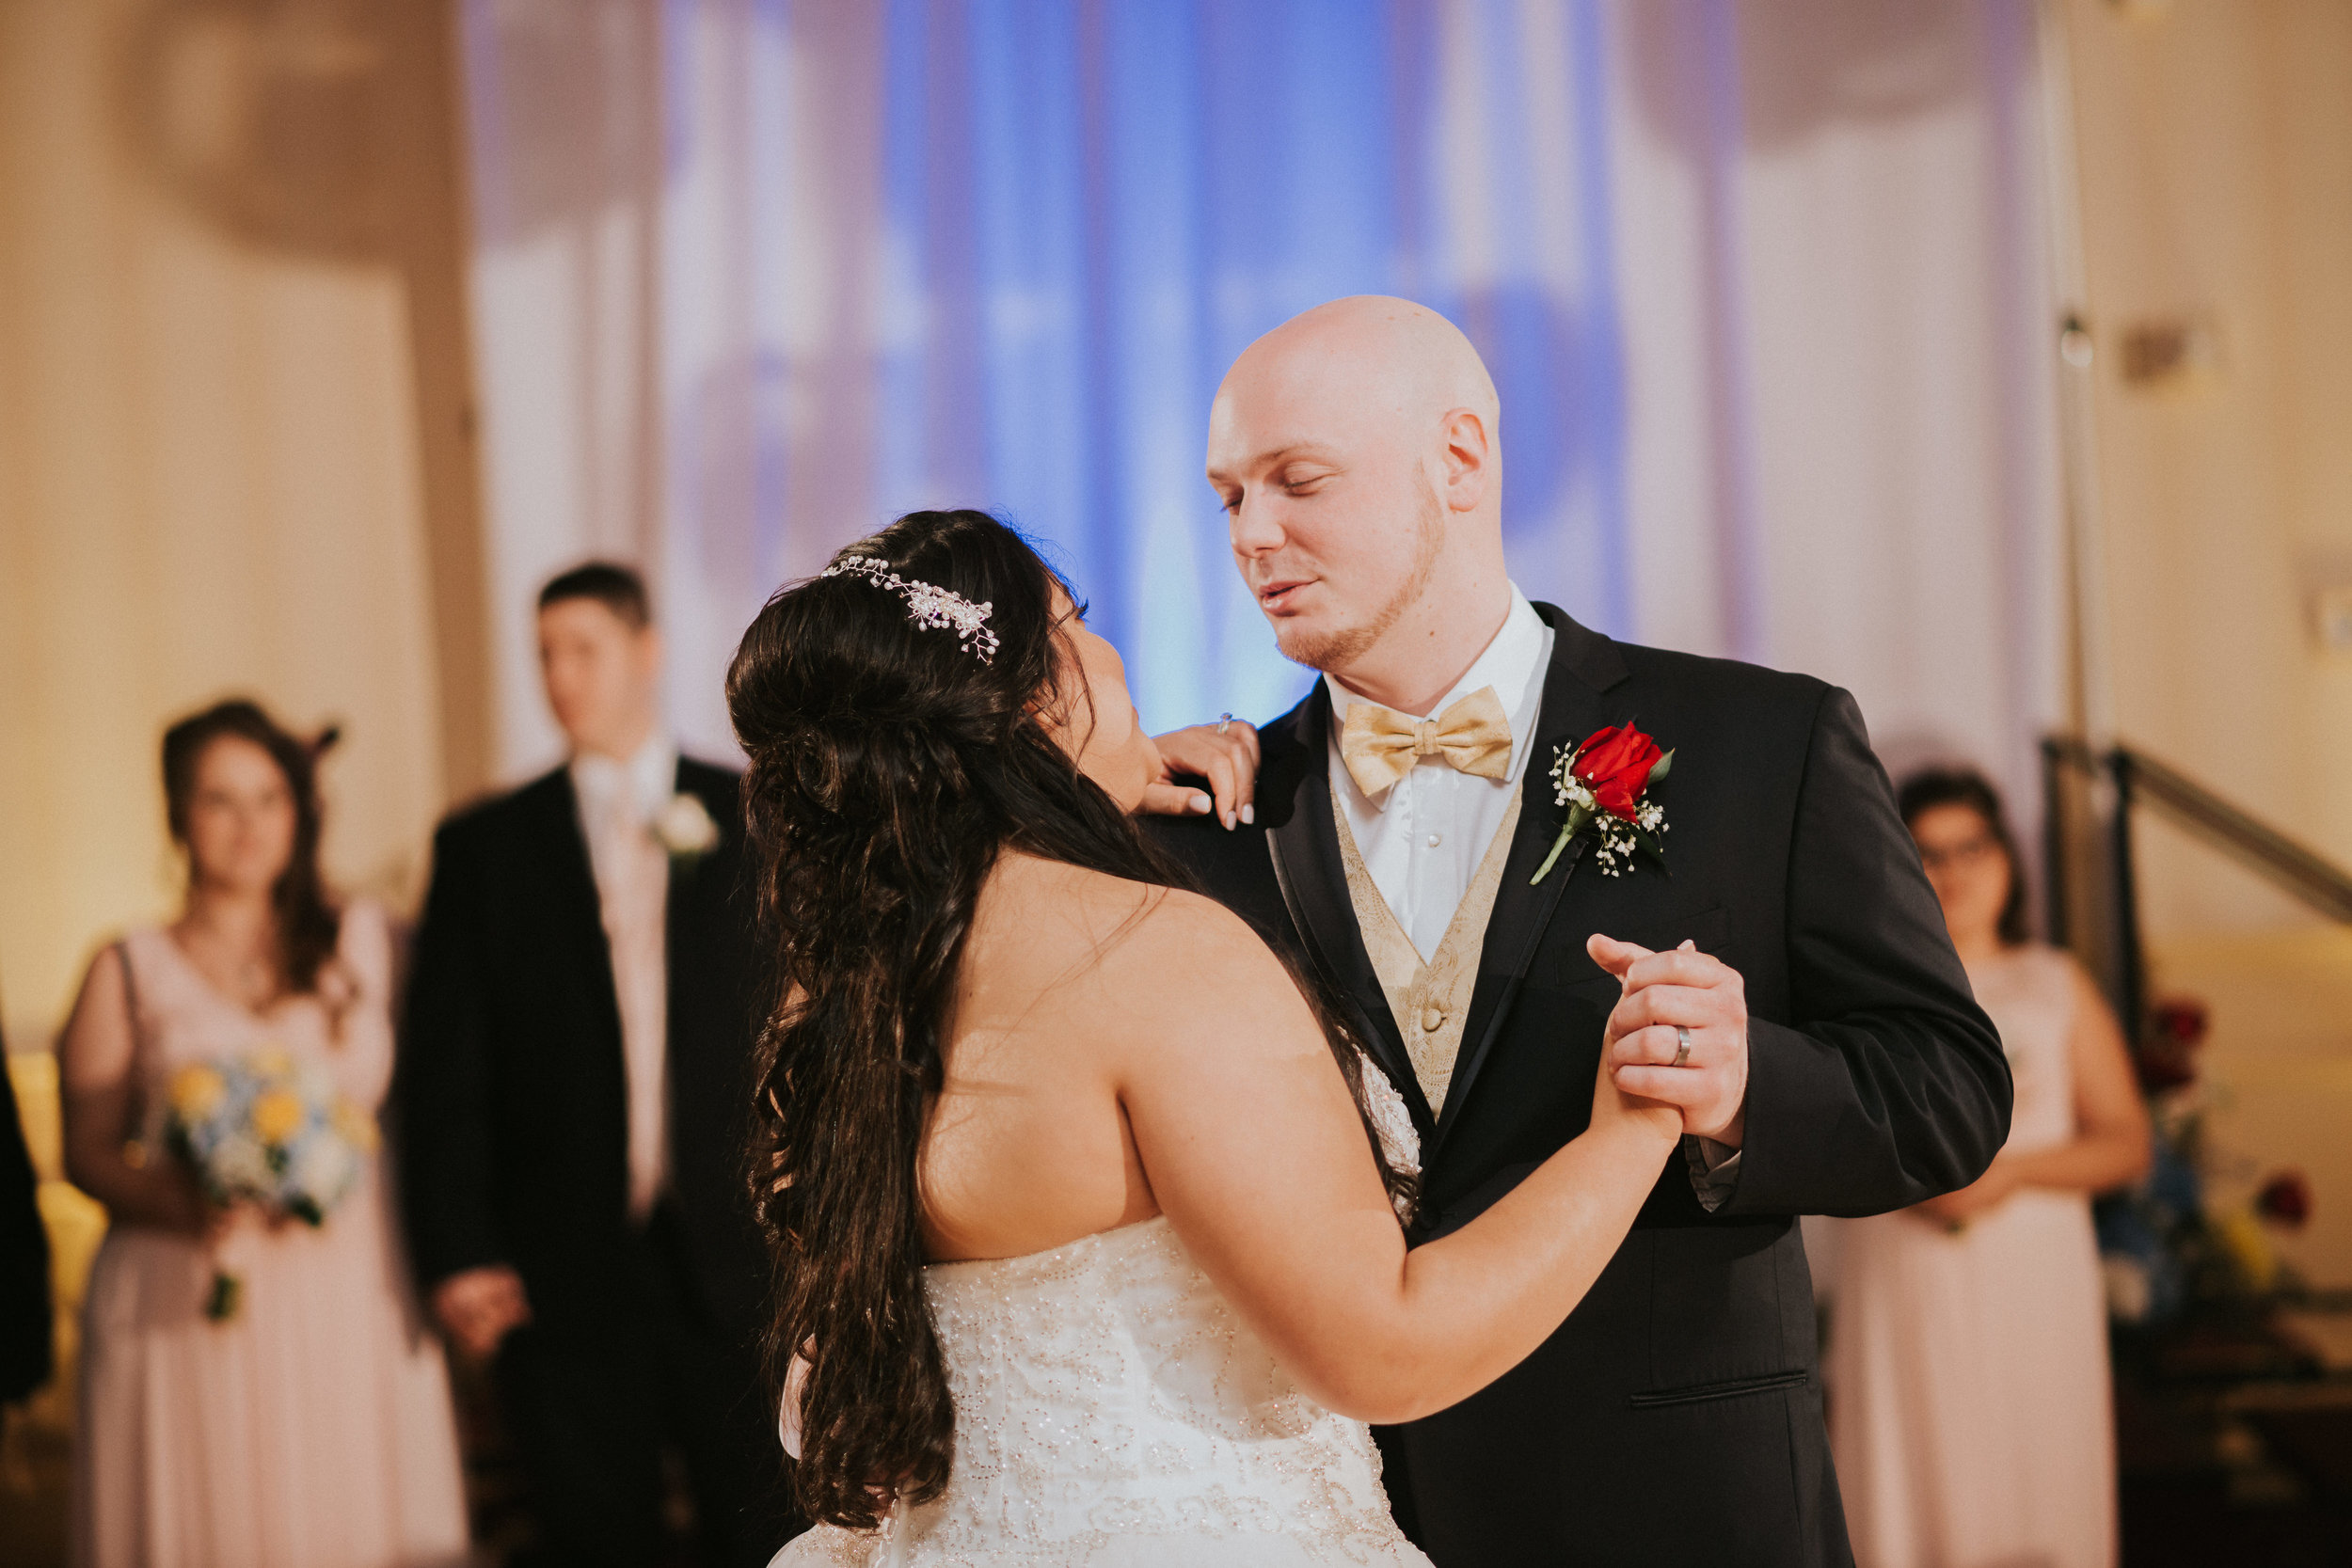 Barclay-Farmstead-Wedding-Rosa-and-Mike-527.jpg